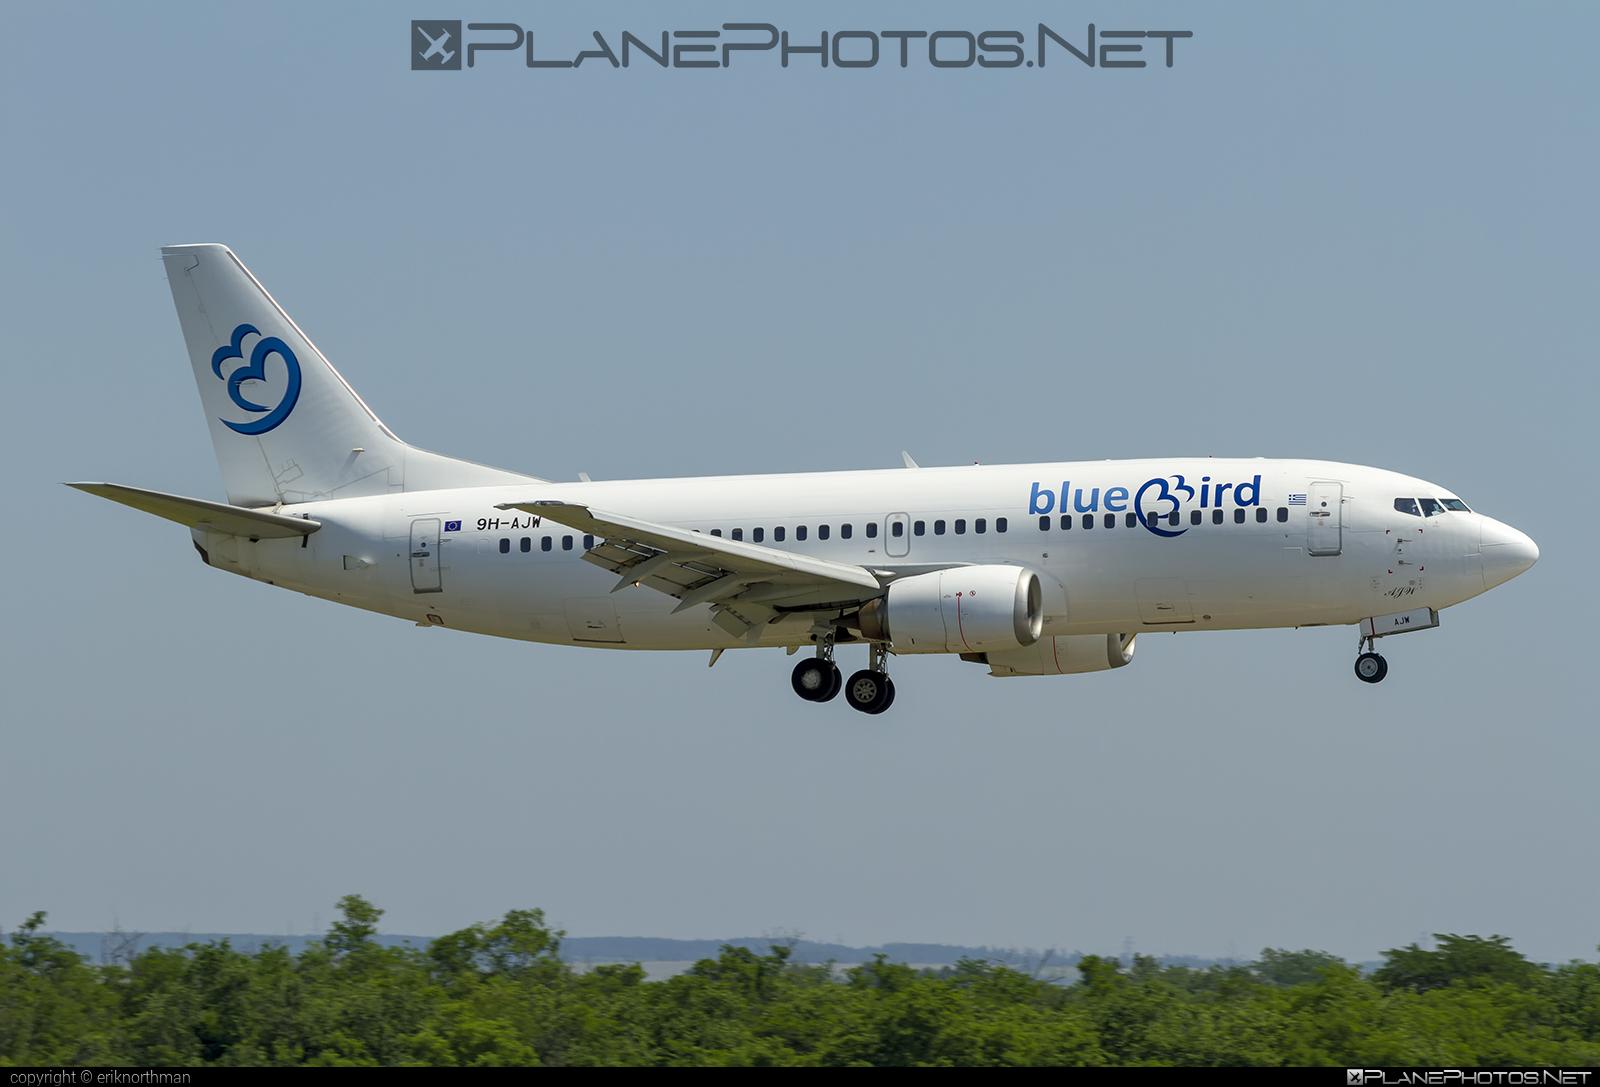 Boeing 737-300 - 9H-AJW operated by Bluebird Airways #b737 #boeing #boeing737